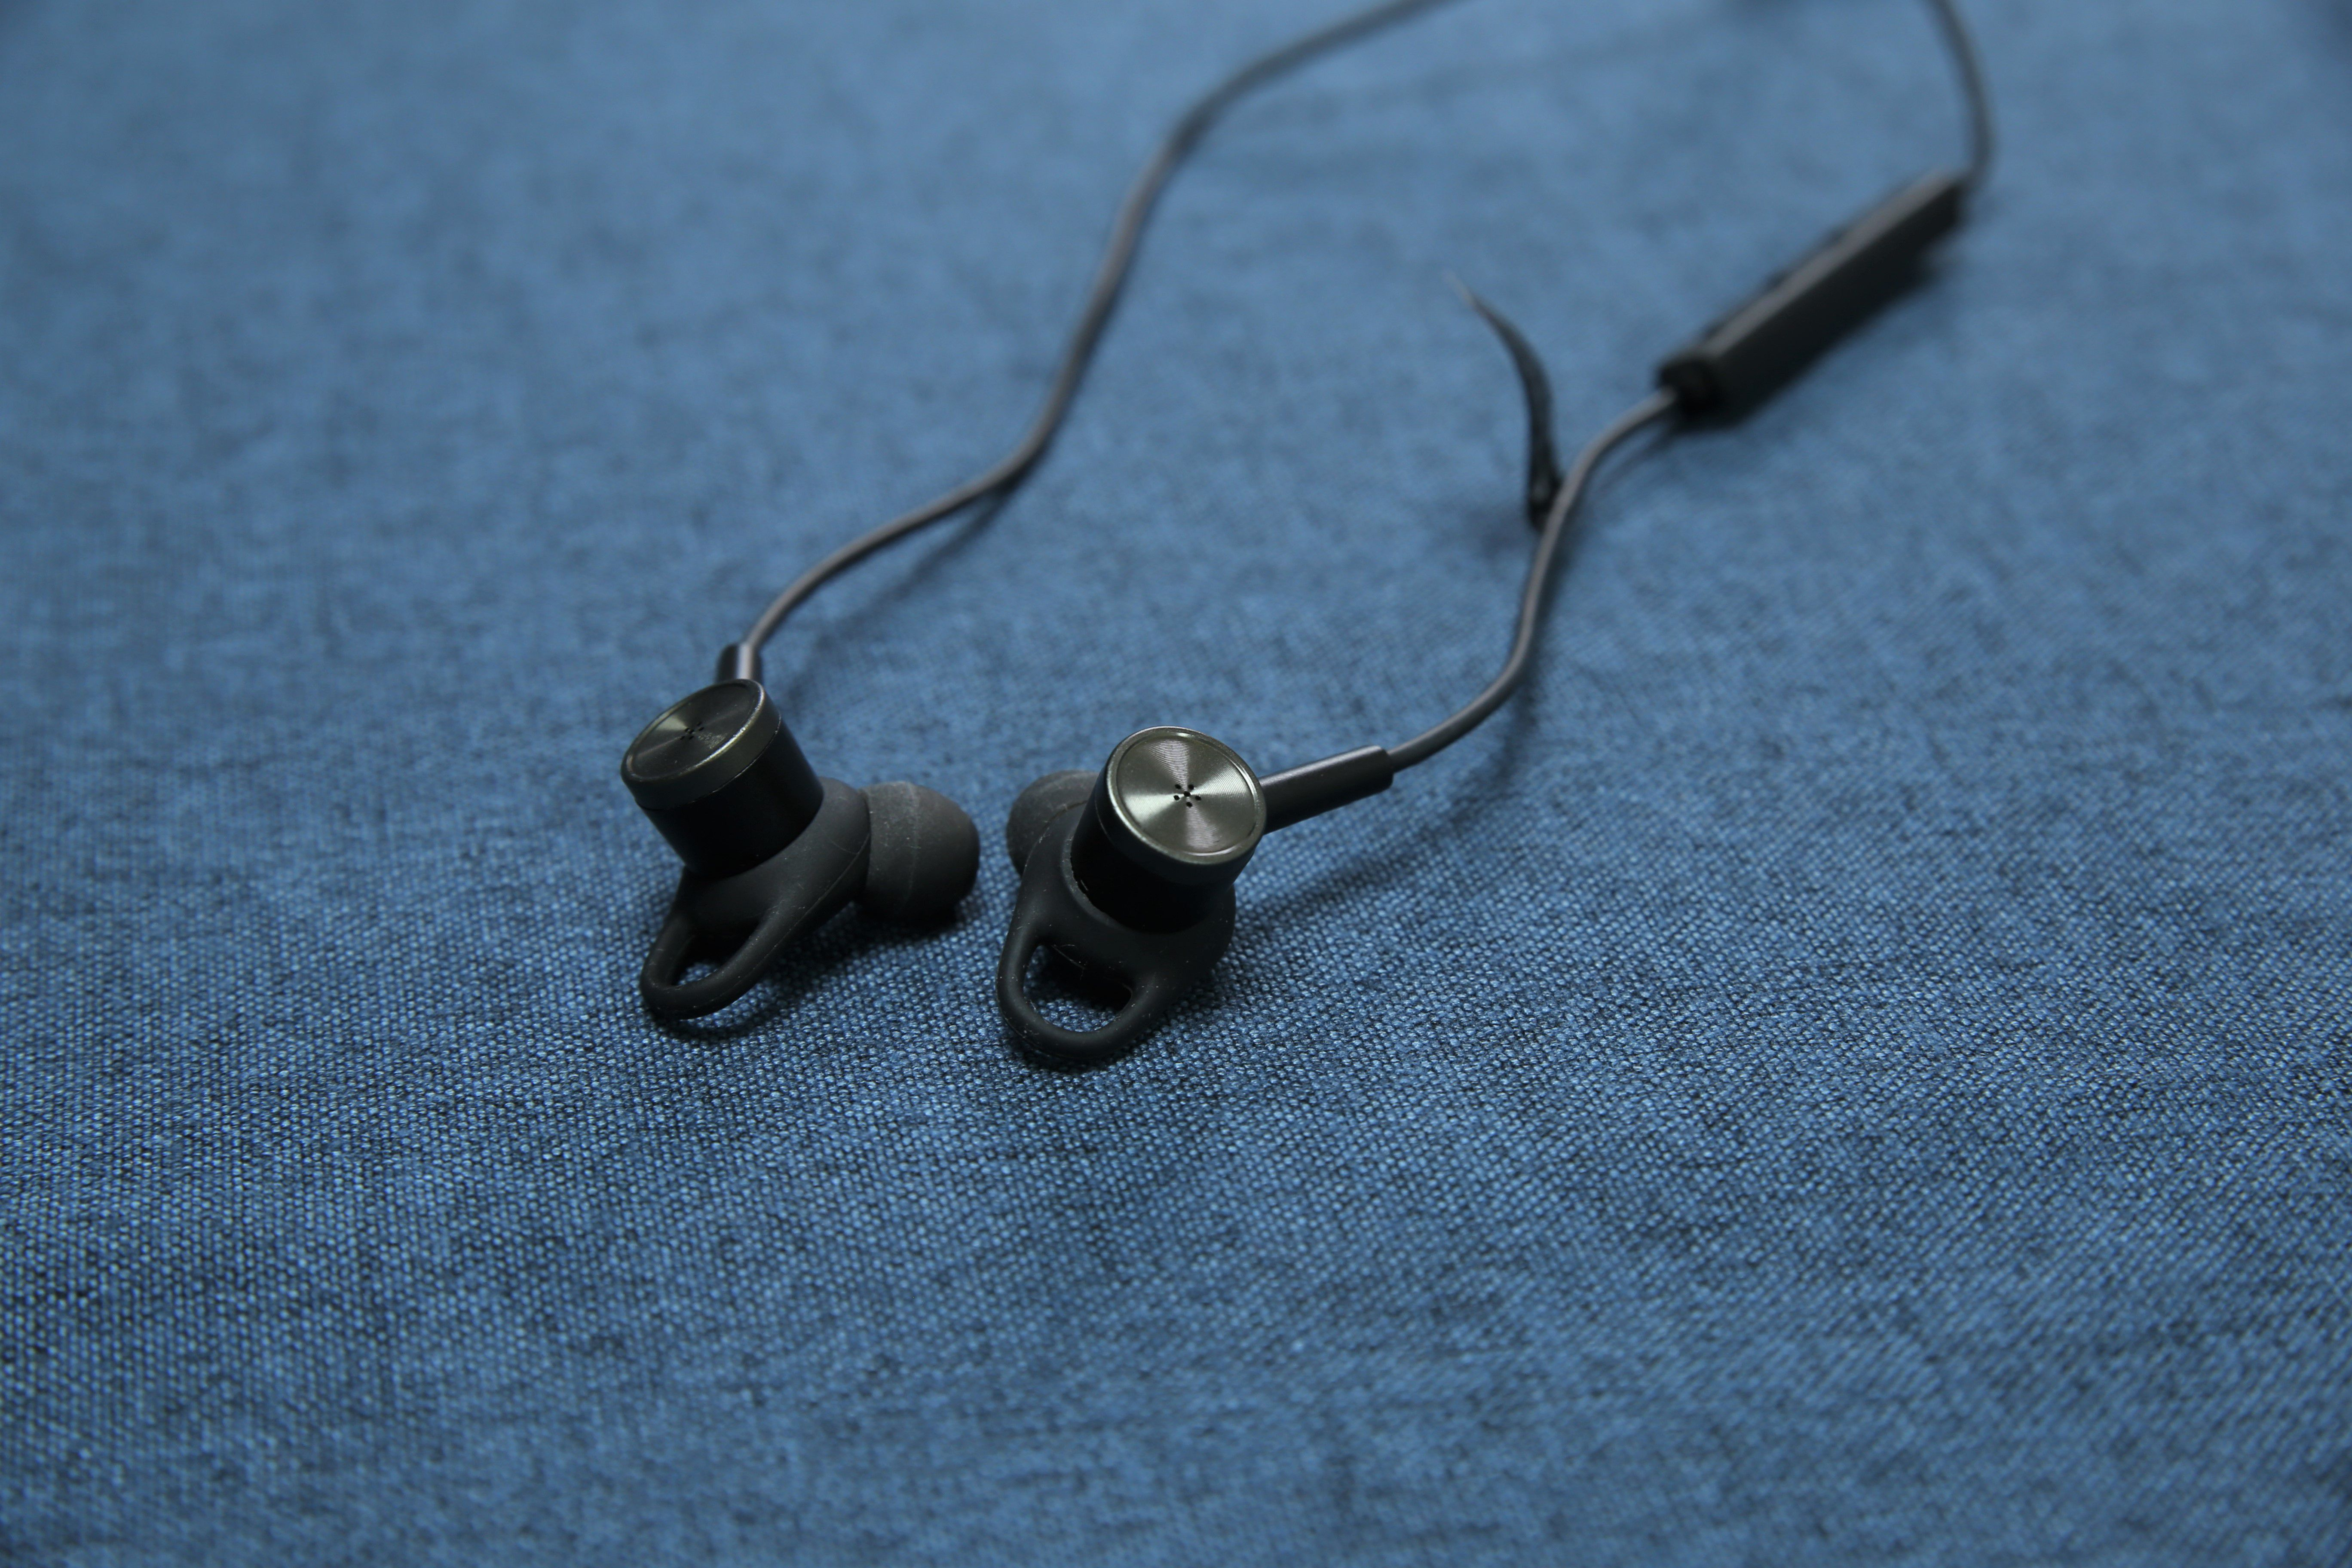 TaoTronics TT-BH042頸掛式降噪藍牙耳機 - 同心圓磁鐵